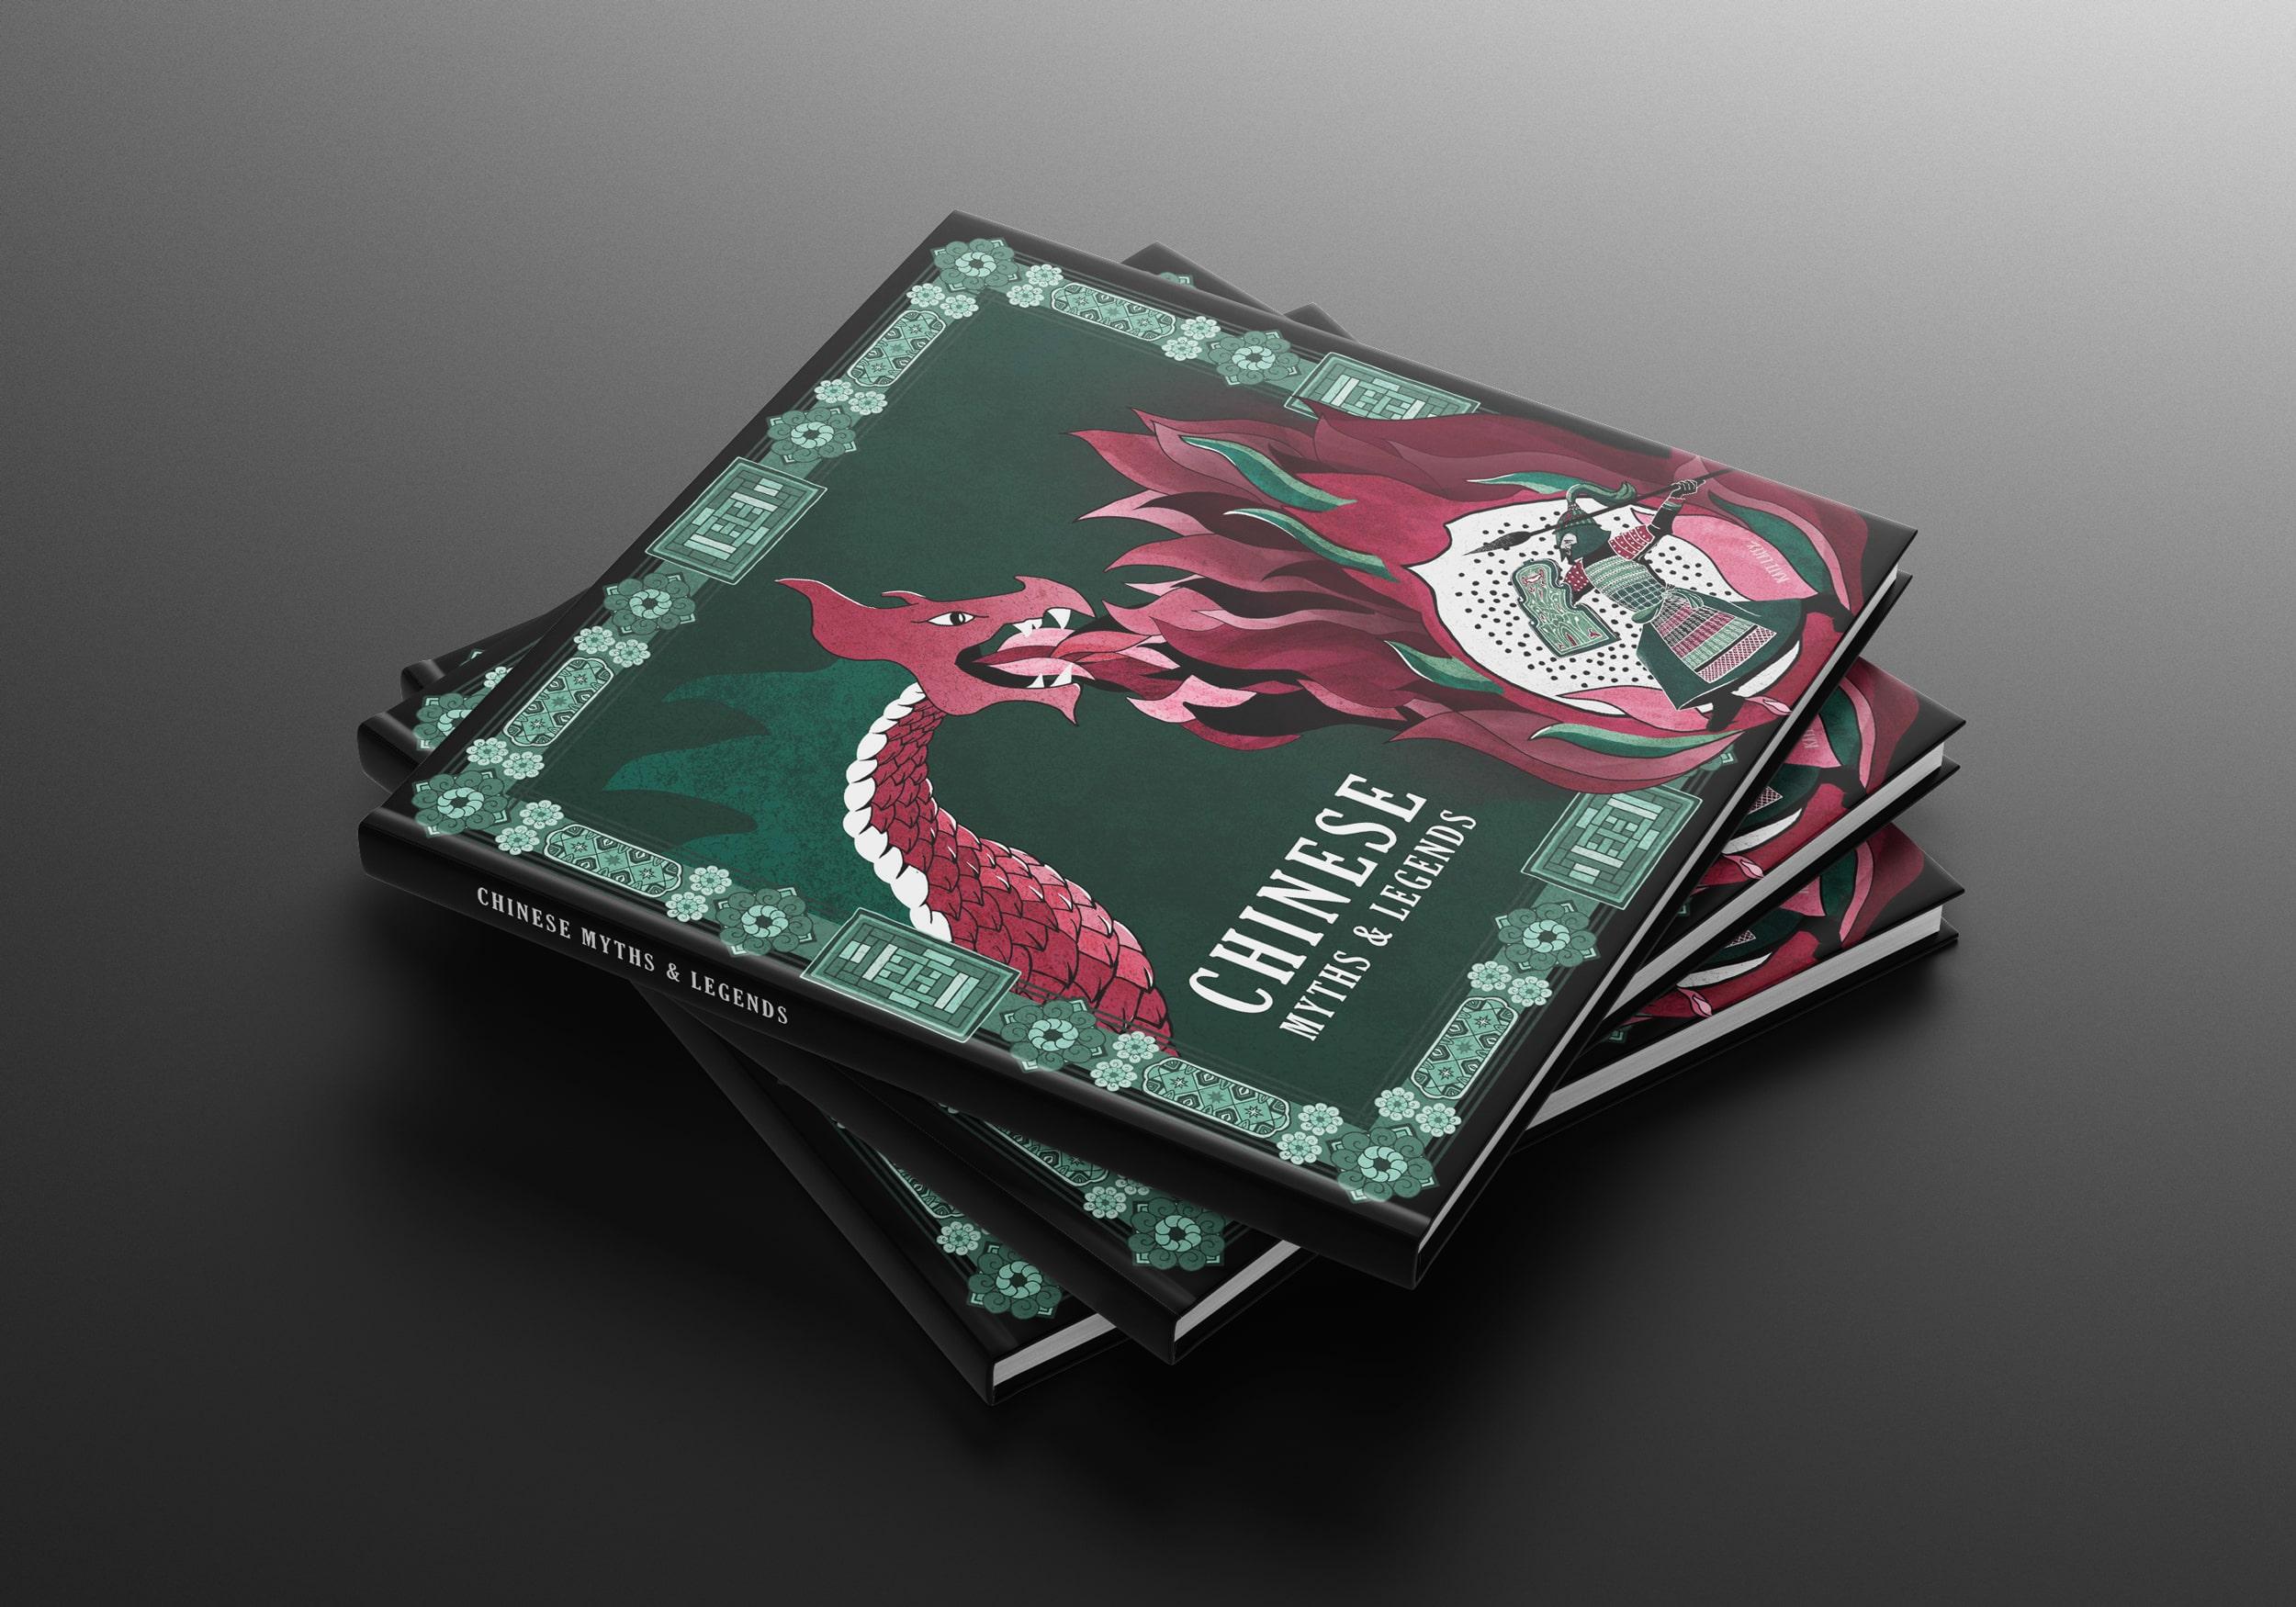 Chinese-myths-legends-book-cover-design-illustration